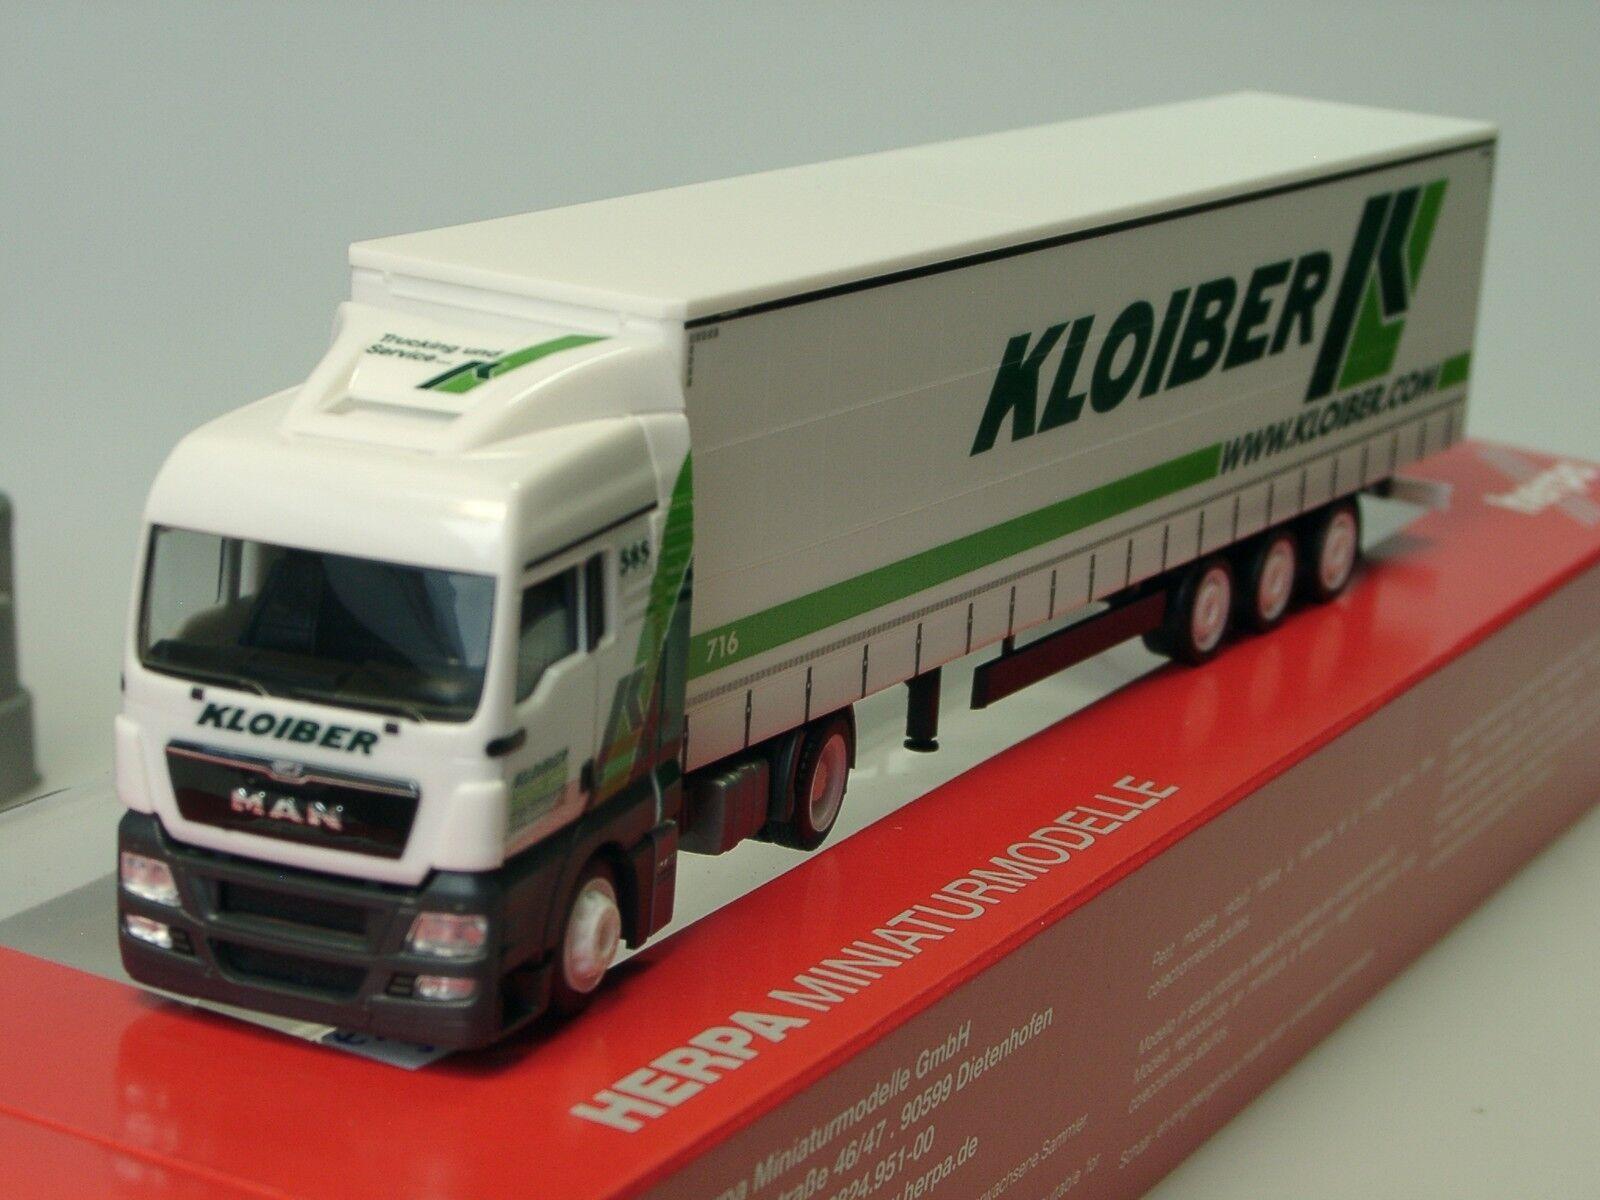 Herpa MAN TGX XLX KLOIBER Lowliner Sz - 305013 - 1 87  | Verrückter Preis